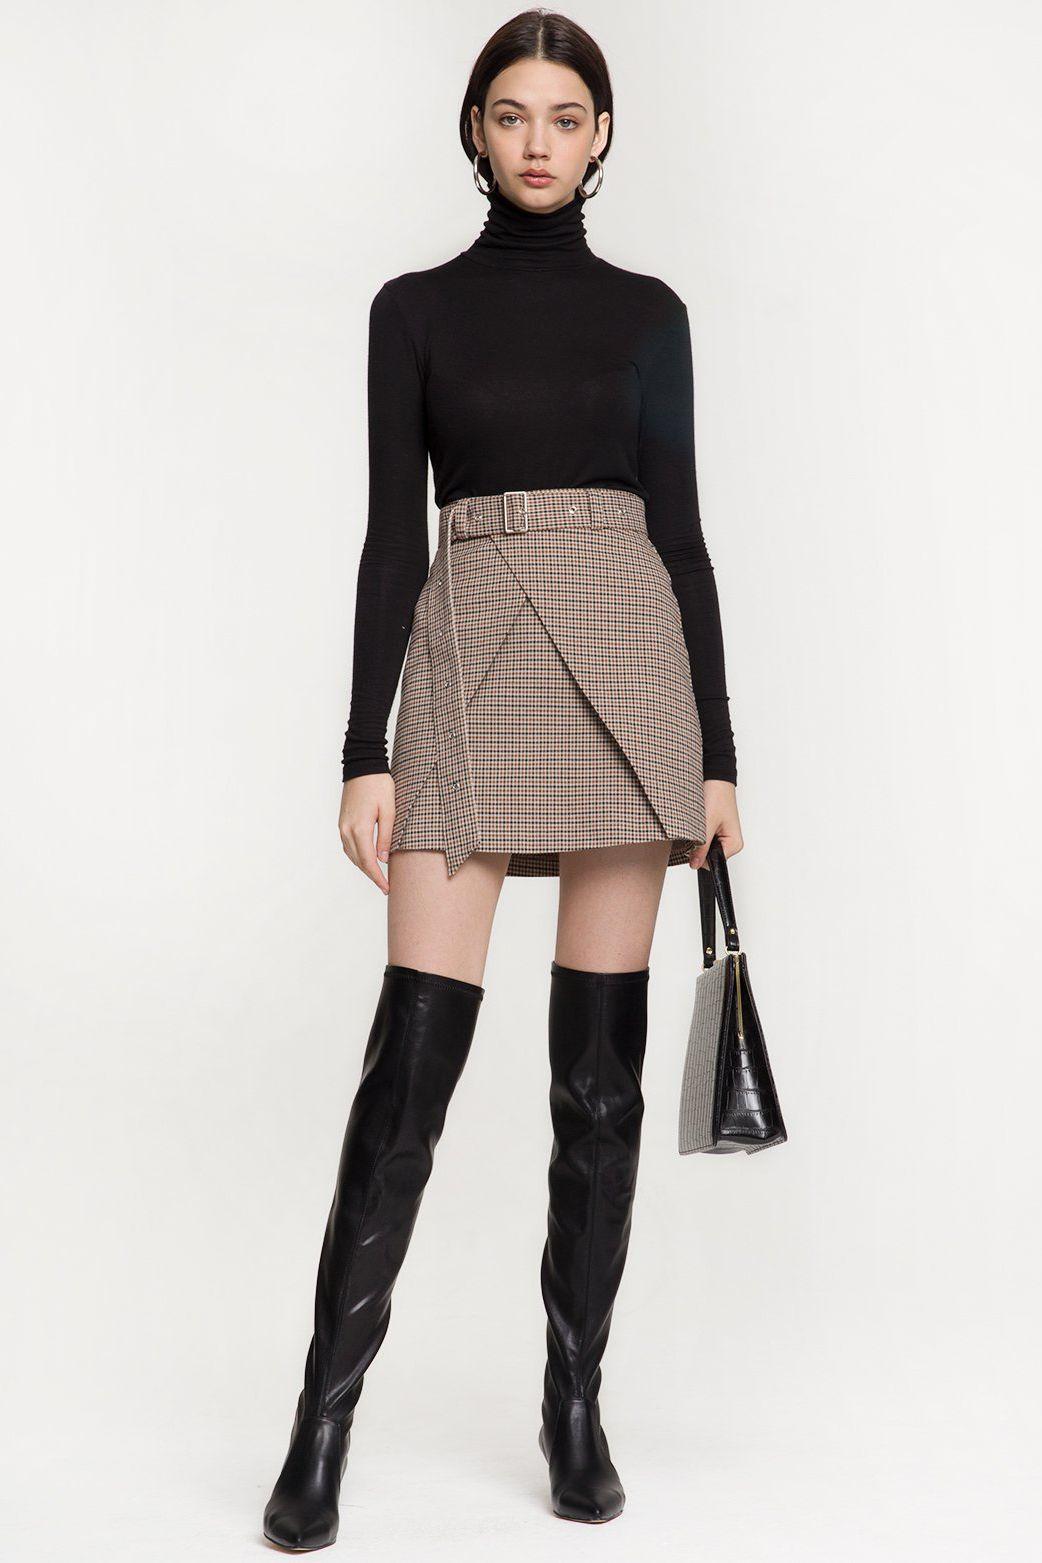 9034f9071f Affordable Fashion Websites to Shop - Budget Fashion Sites